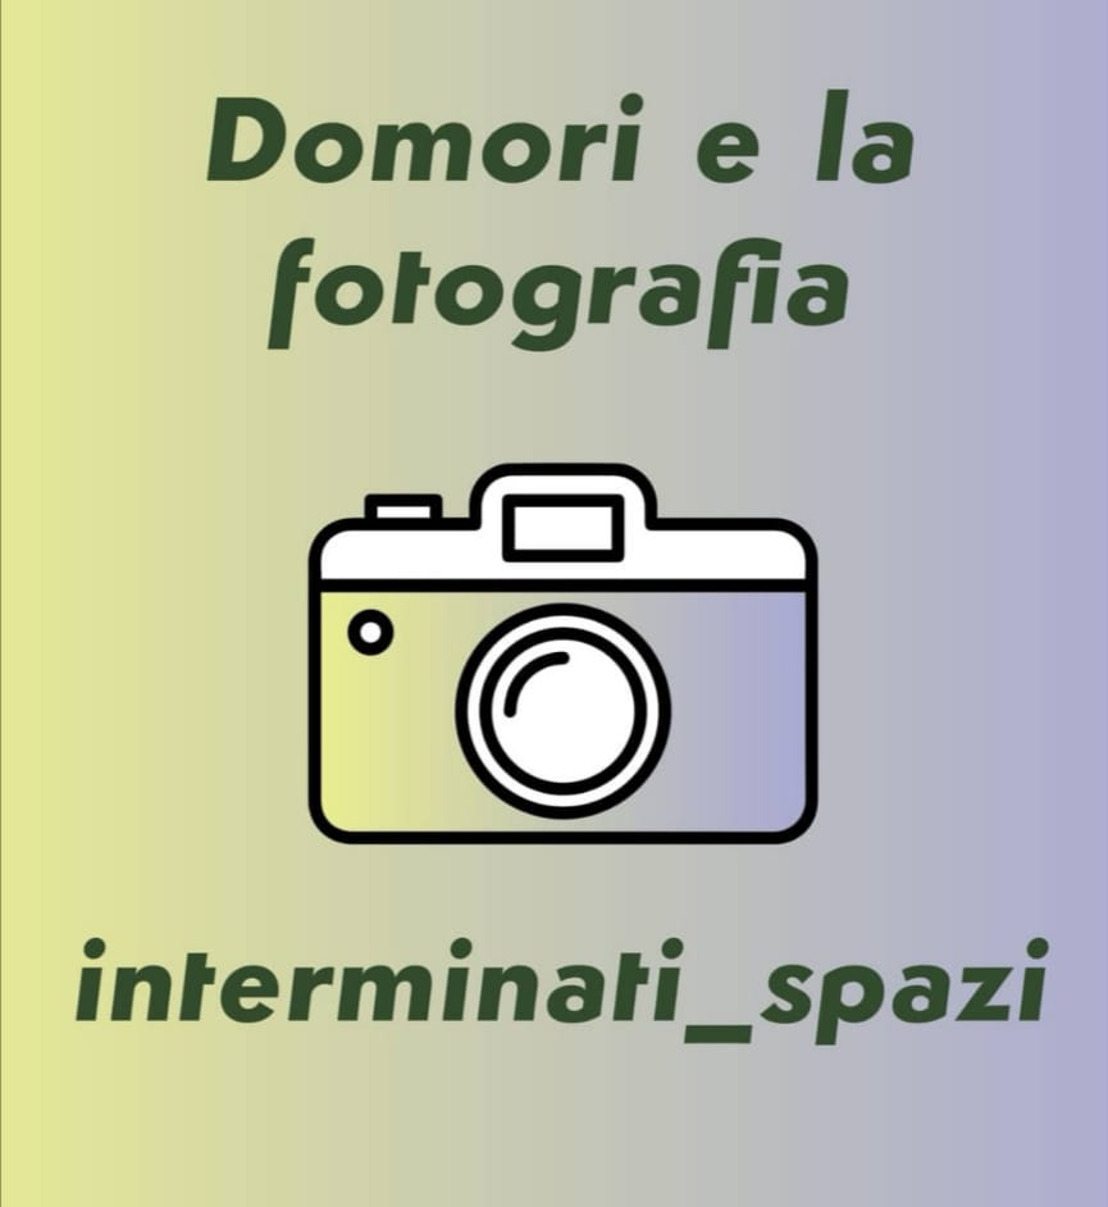 #interminati_spazi: i 3 vincitori